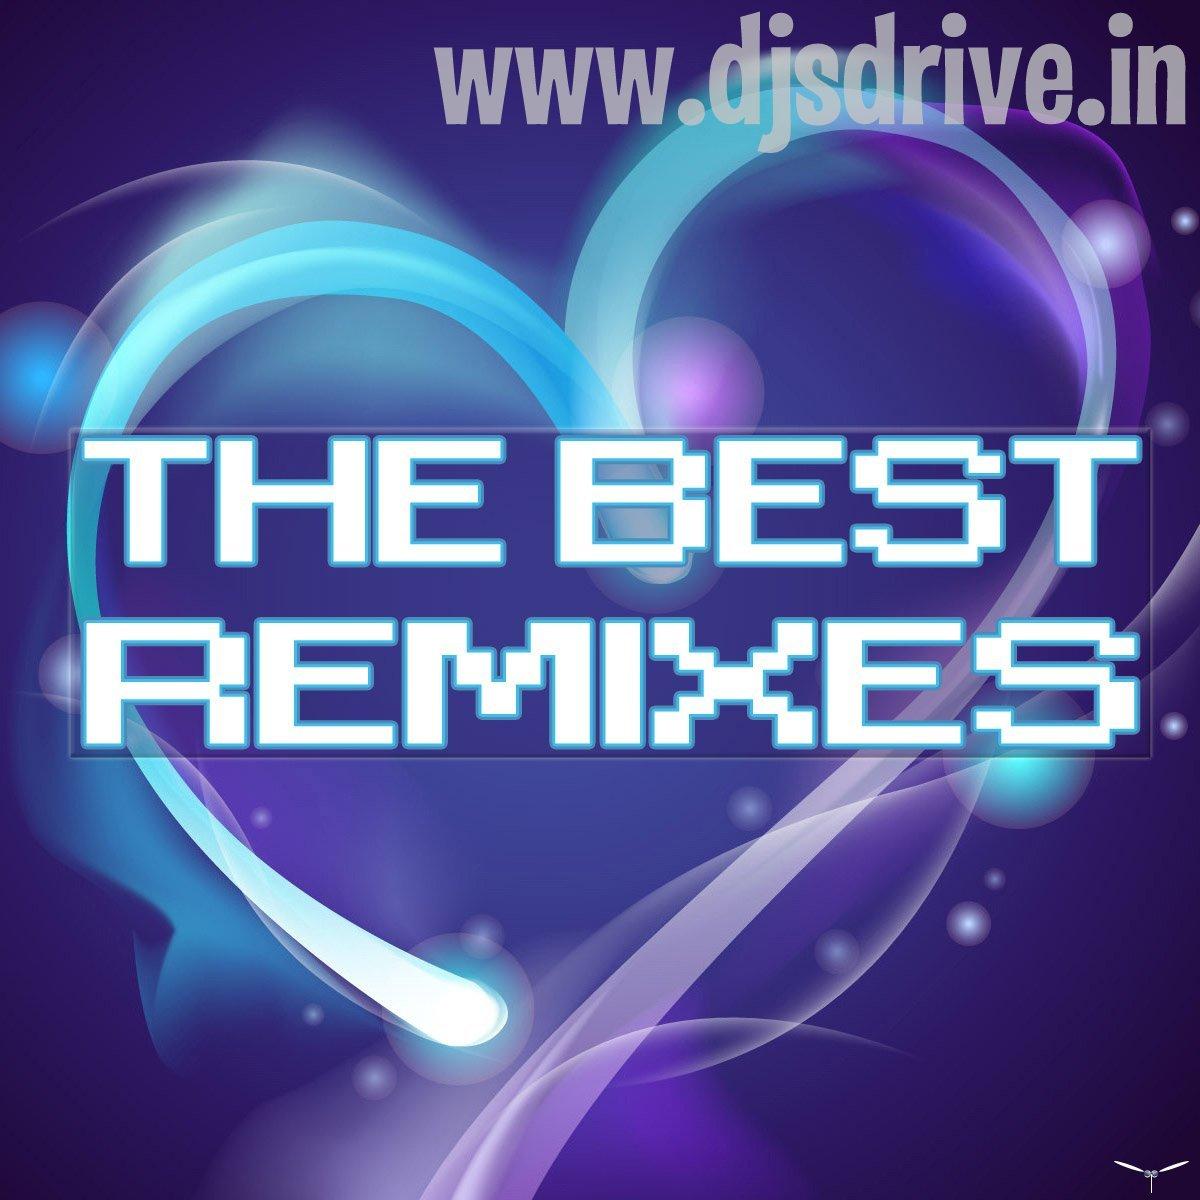 http://4.bp.blogspot.com/-JzkaC1e8uFE/UFxGVOcACJI/AAAAAAAAEwc/-fUtWjVMYnQ/s1600/The+Best+remixes+%5B+www.DjsDrive.In+%5D.jpg